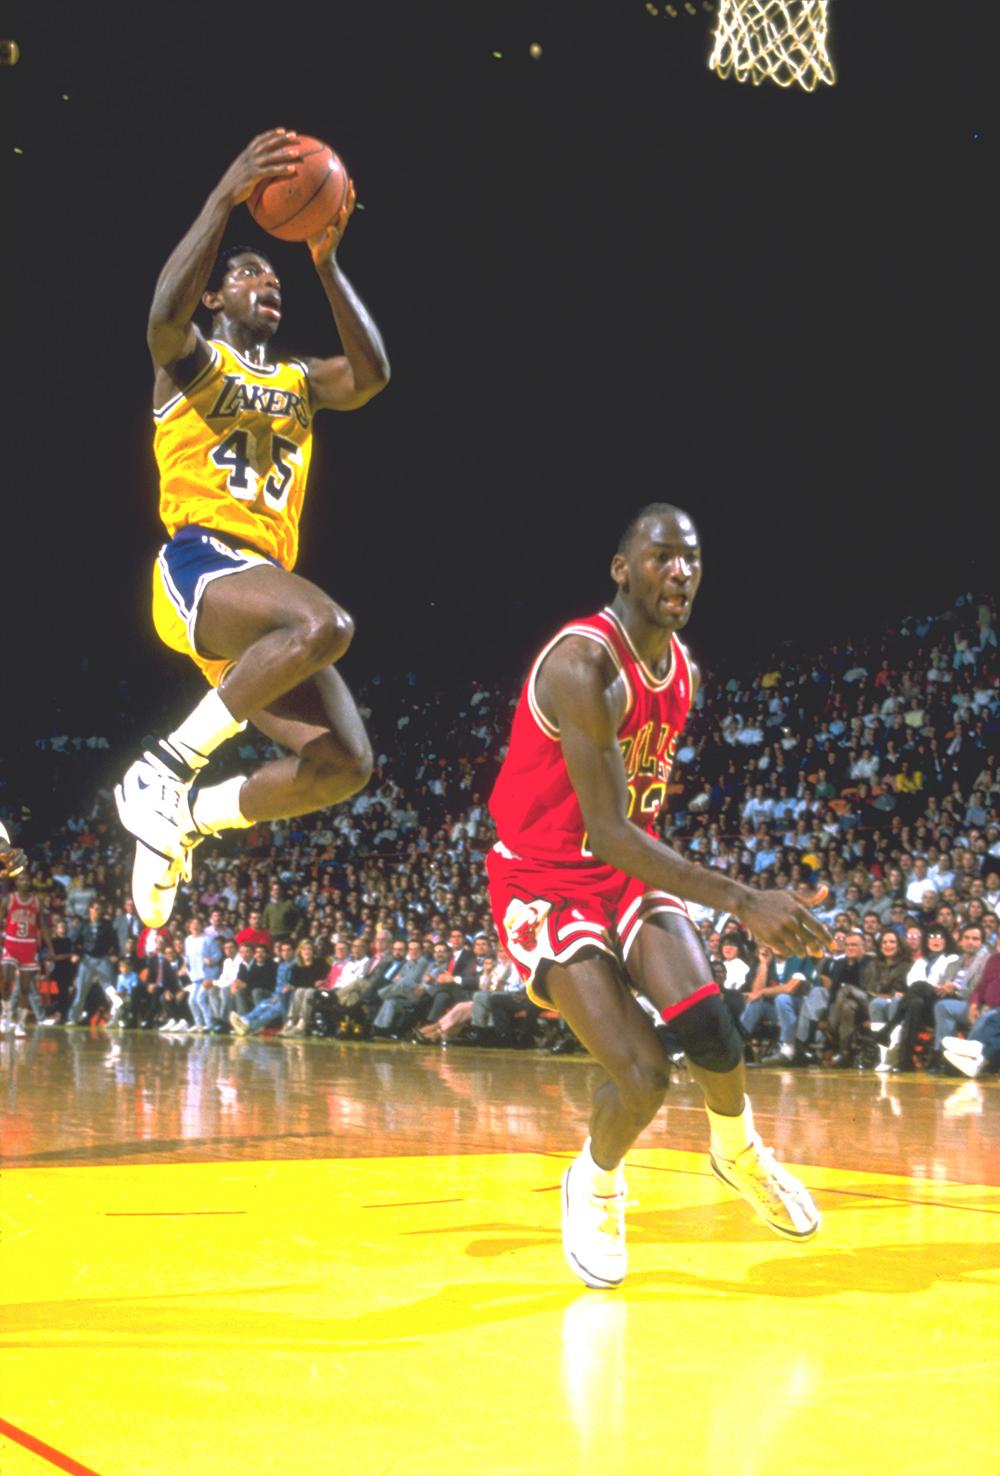 AC takes Michael Jordan to the hole